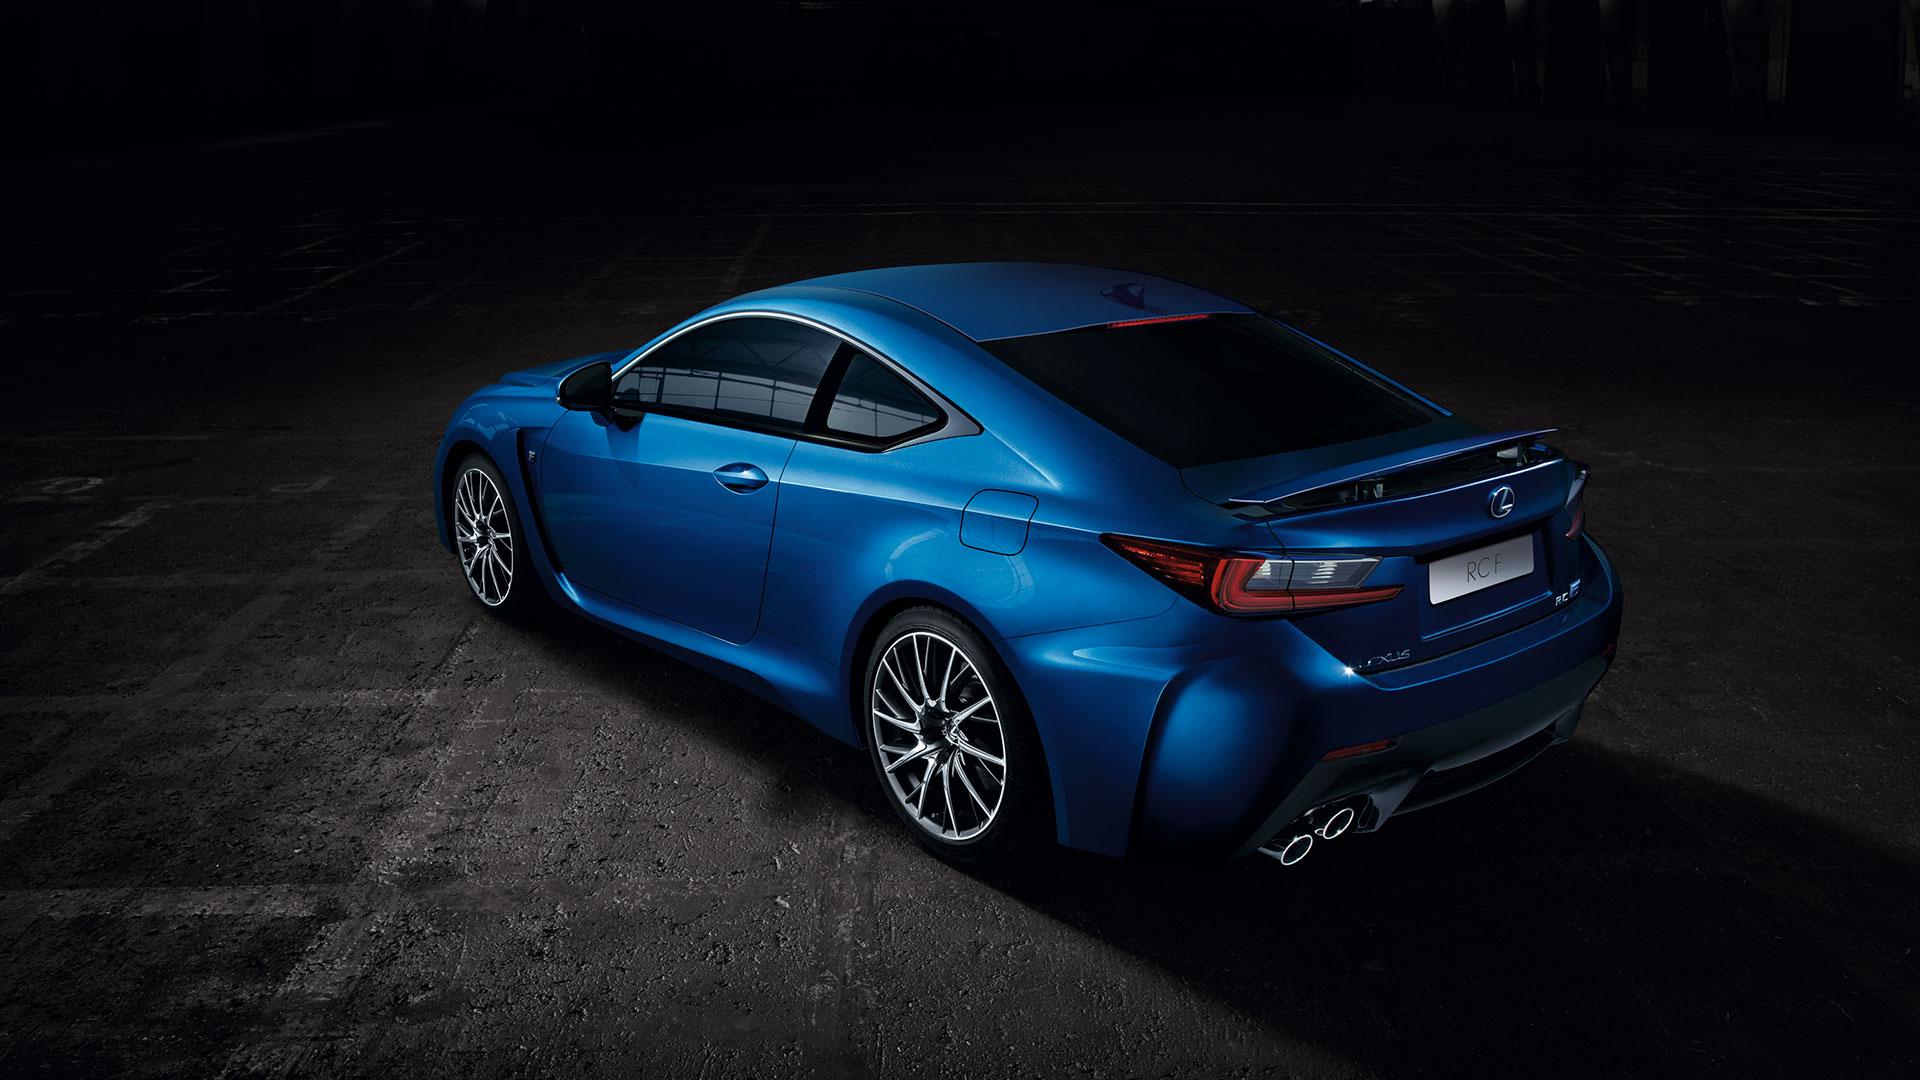 Lexus incorpora tecnología fibra carbono hero asset